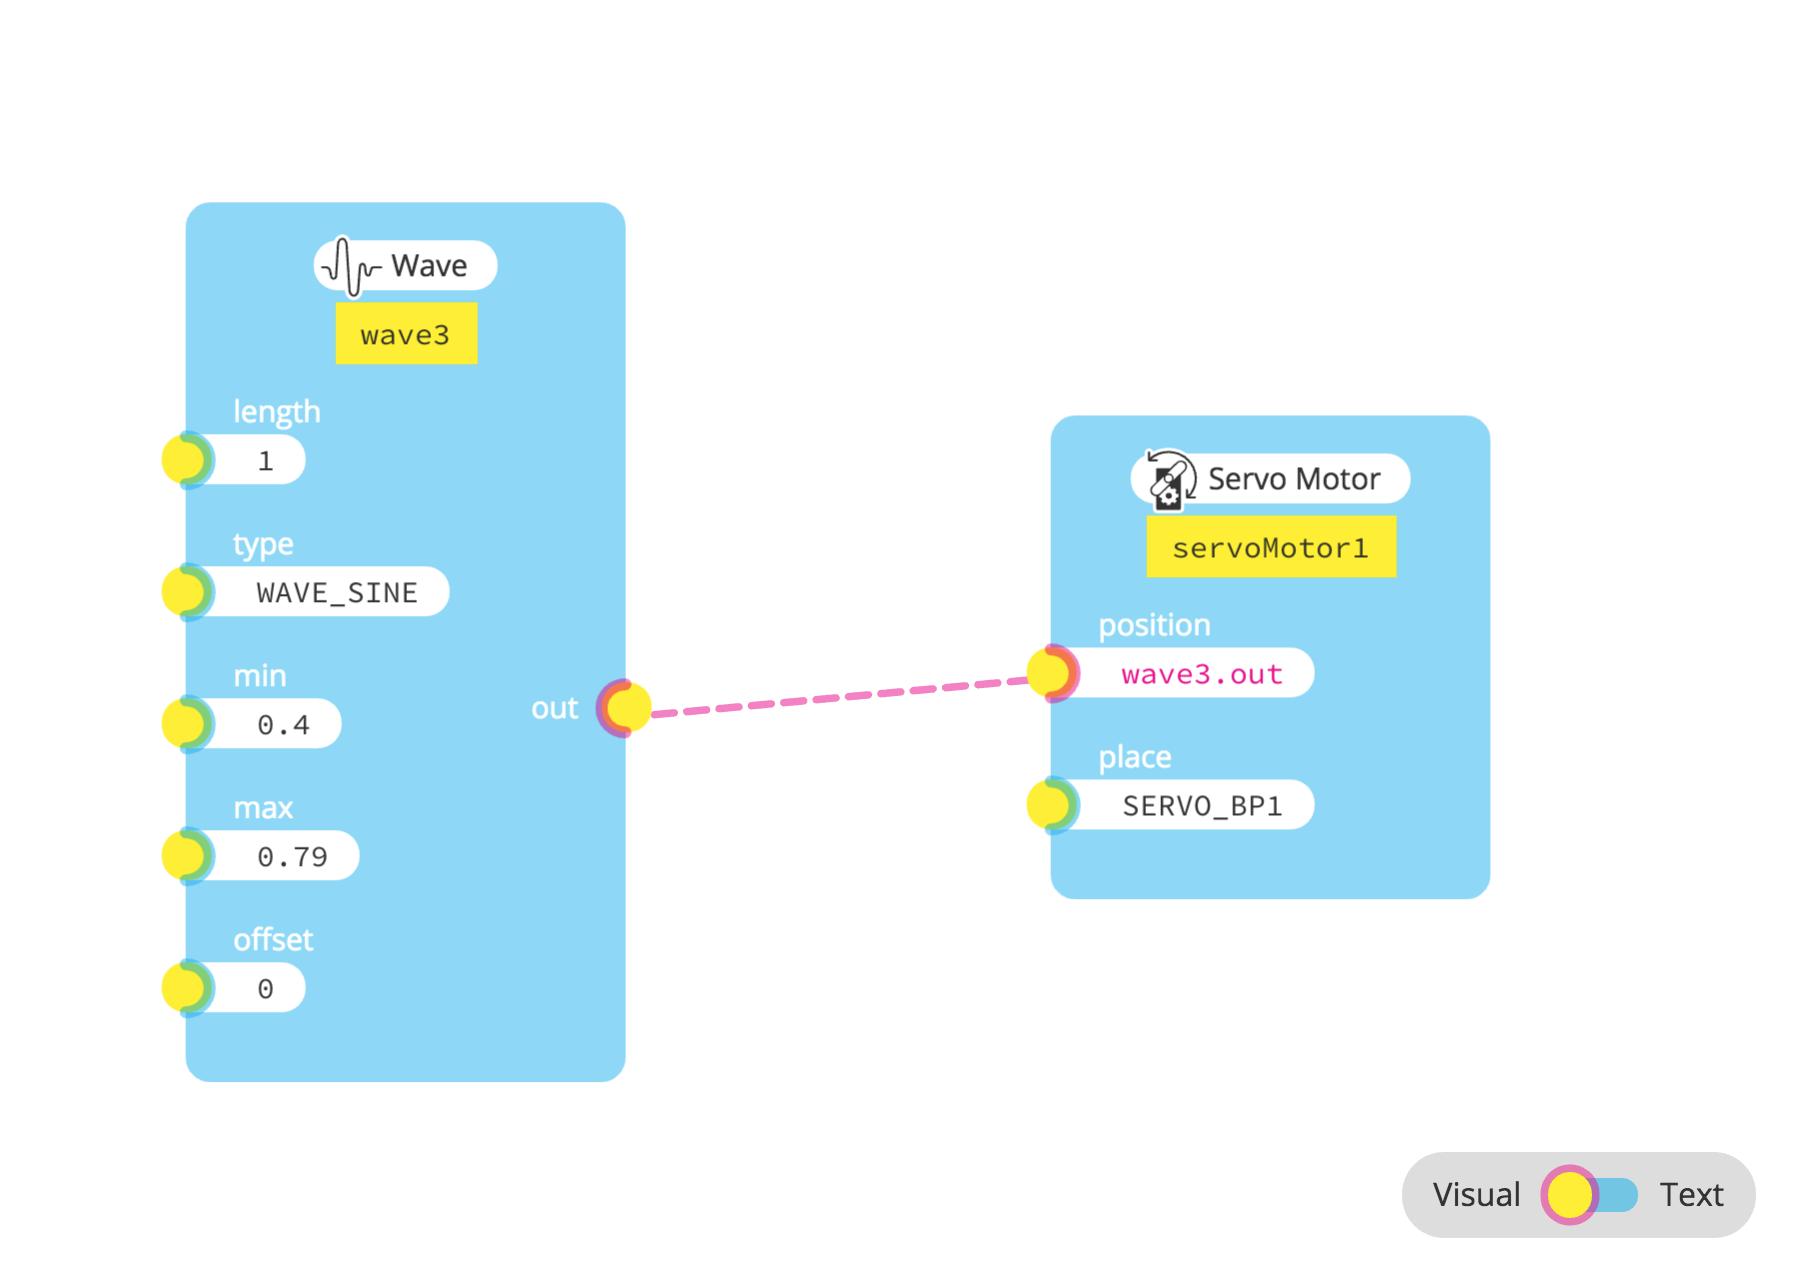 visual_example.png